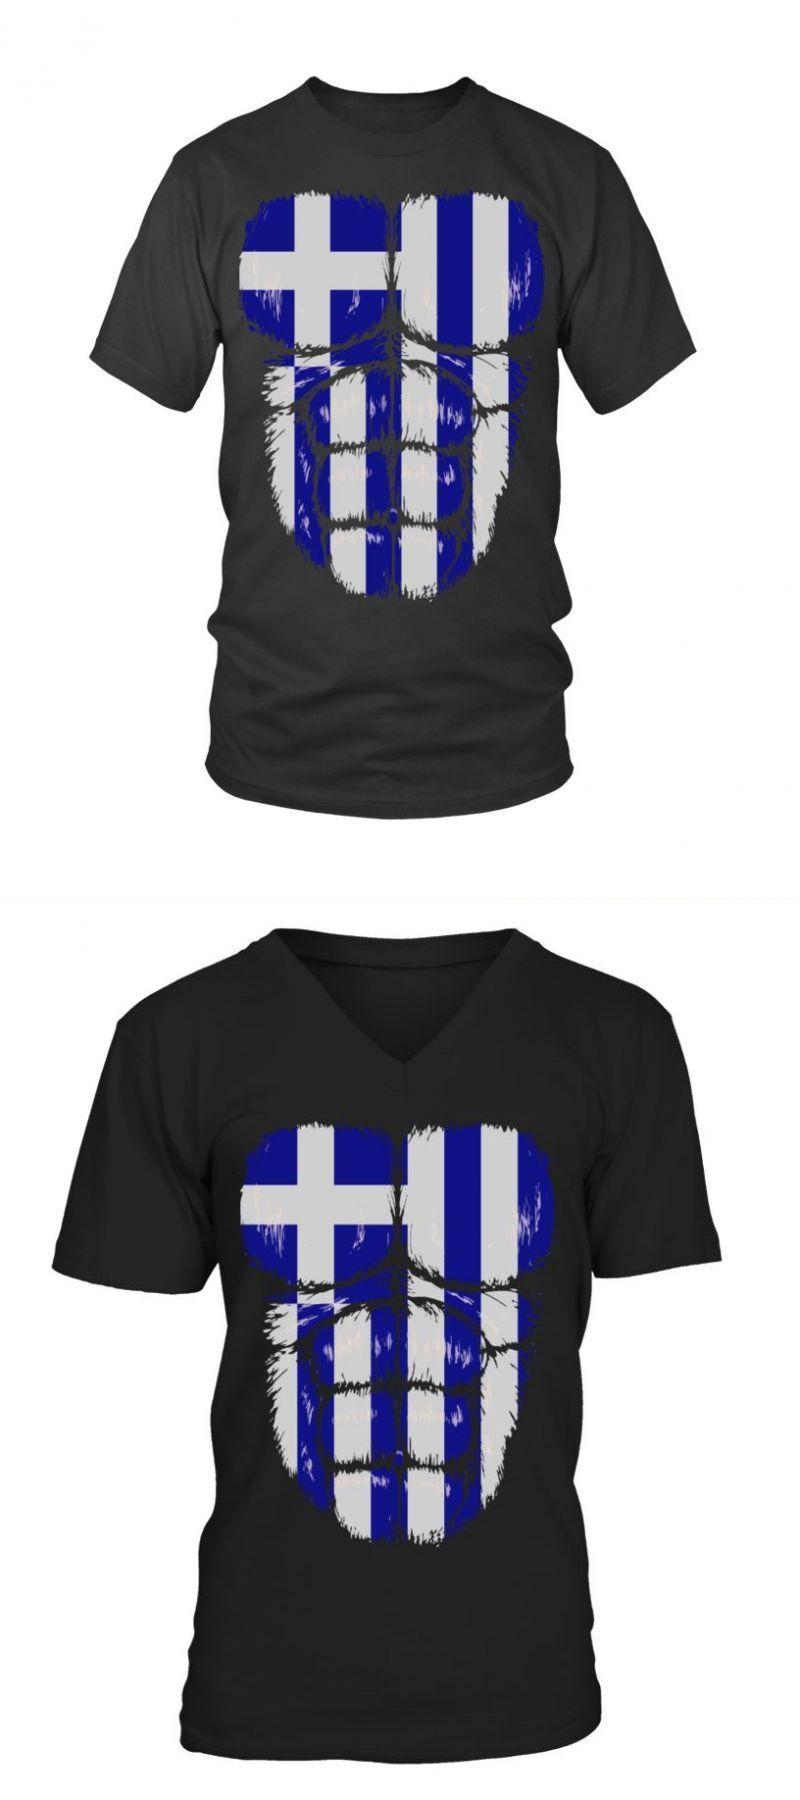 Meister t-shirts sprüche handball griechenland flagge hulk muskeln amazon  handball t shirt  meister  t-shirts  sprüche  handball  griechenland   flagge  hulk ... 706193c955